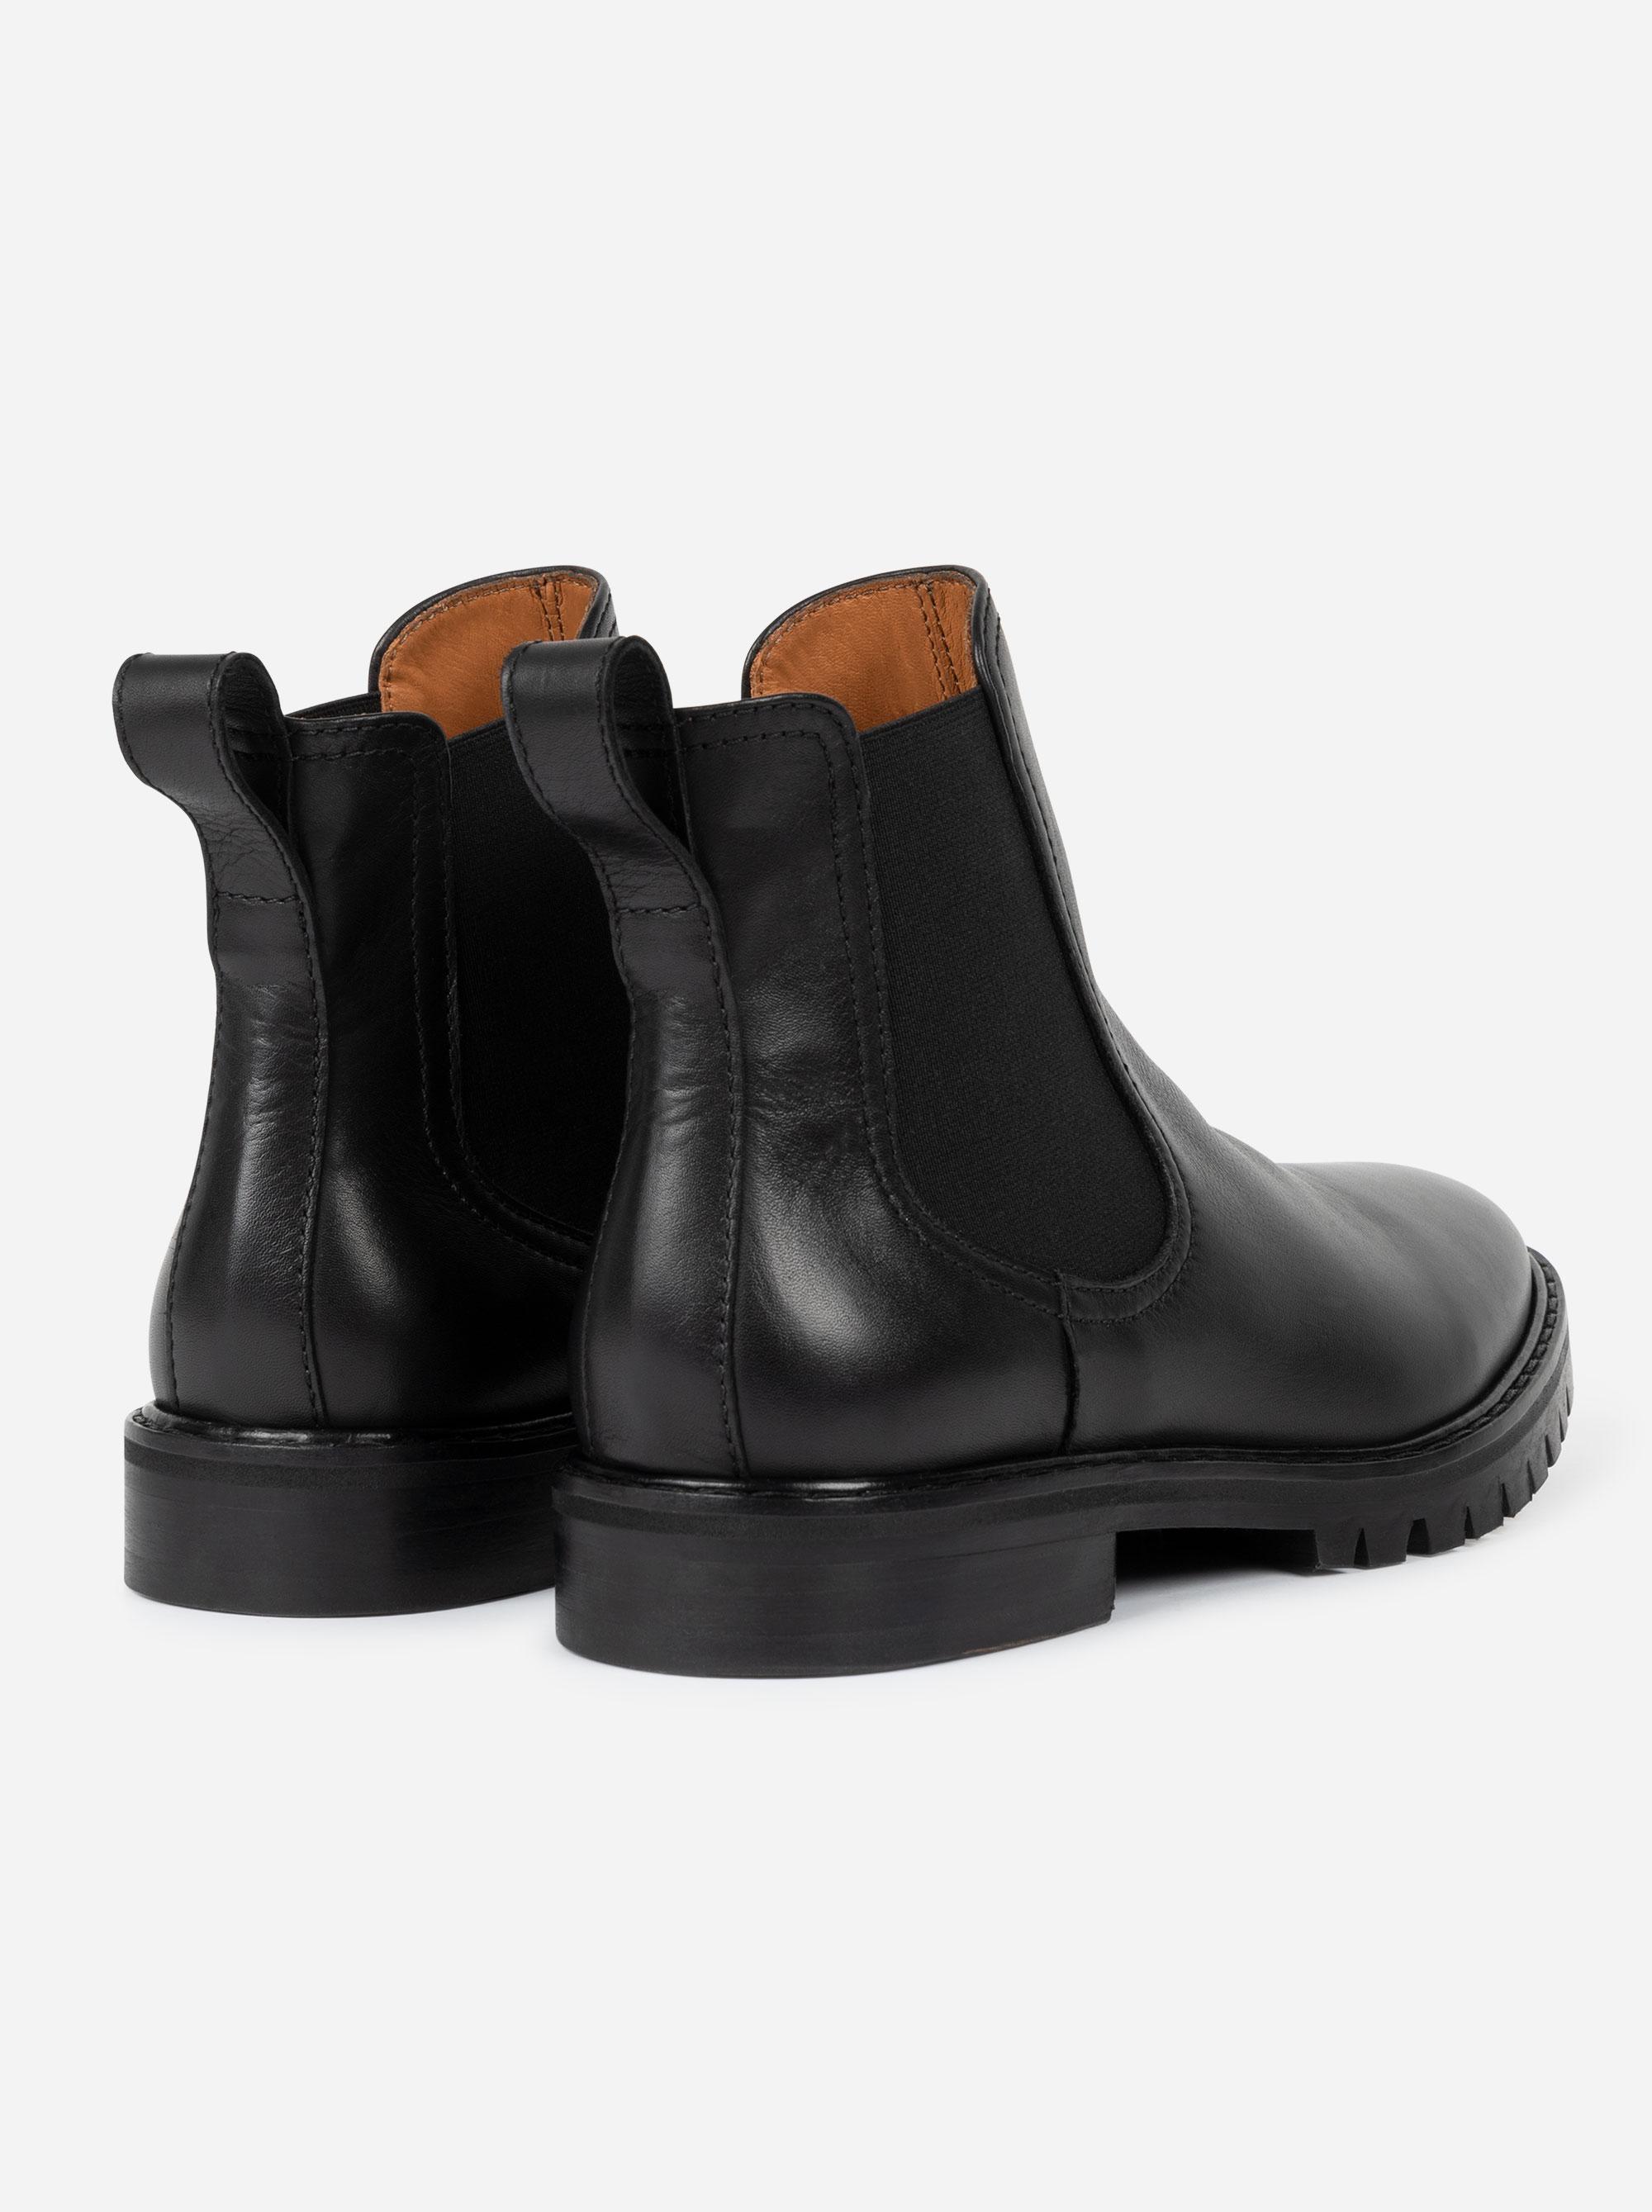 Teym - The Chelsea Boot - Black - 4